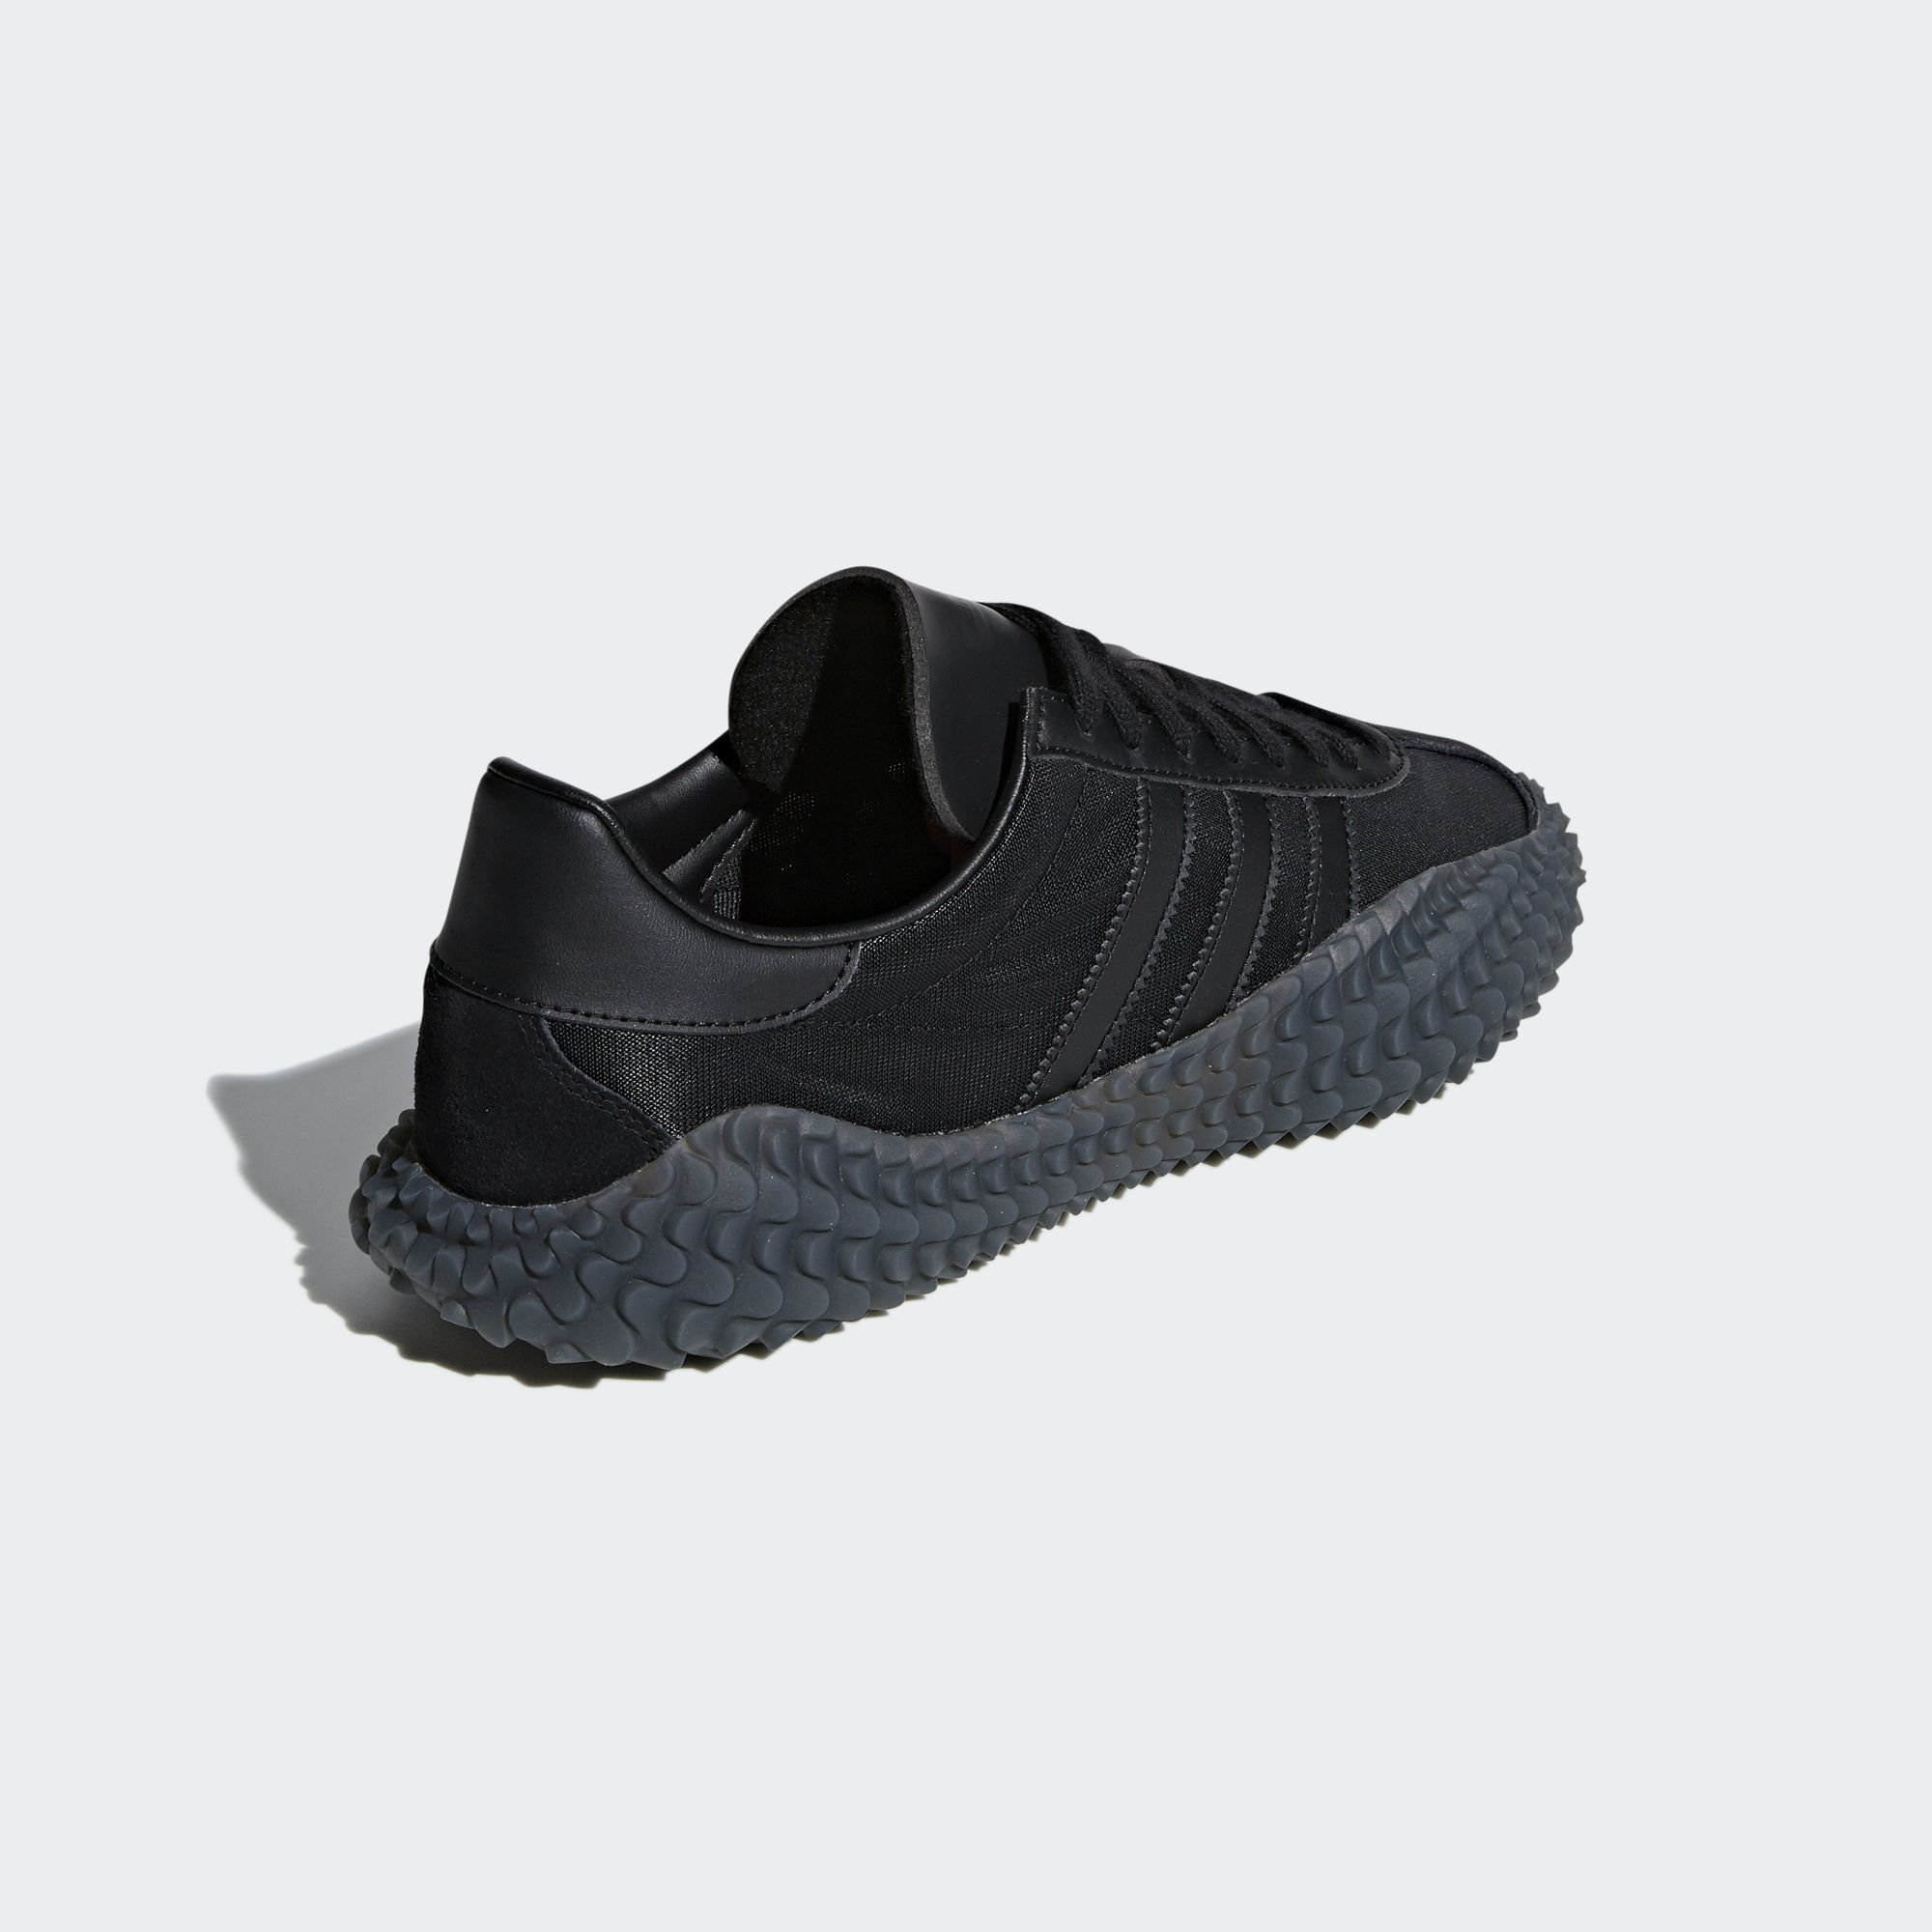 Adidas Country x Kamanda Core Black / Utility Black / Solar Red (EE3642)